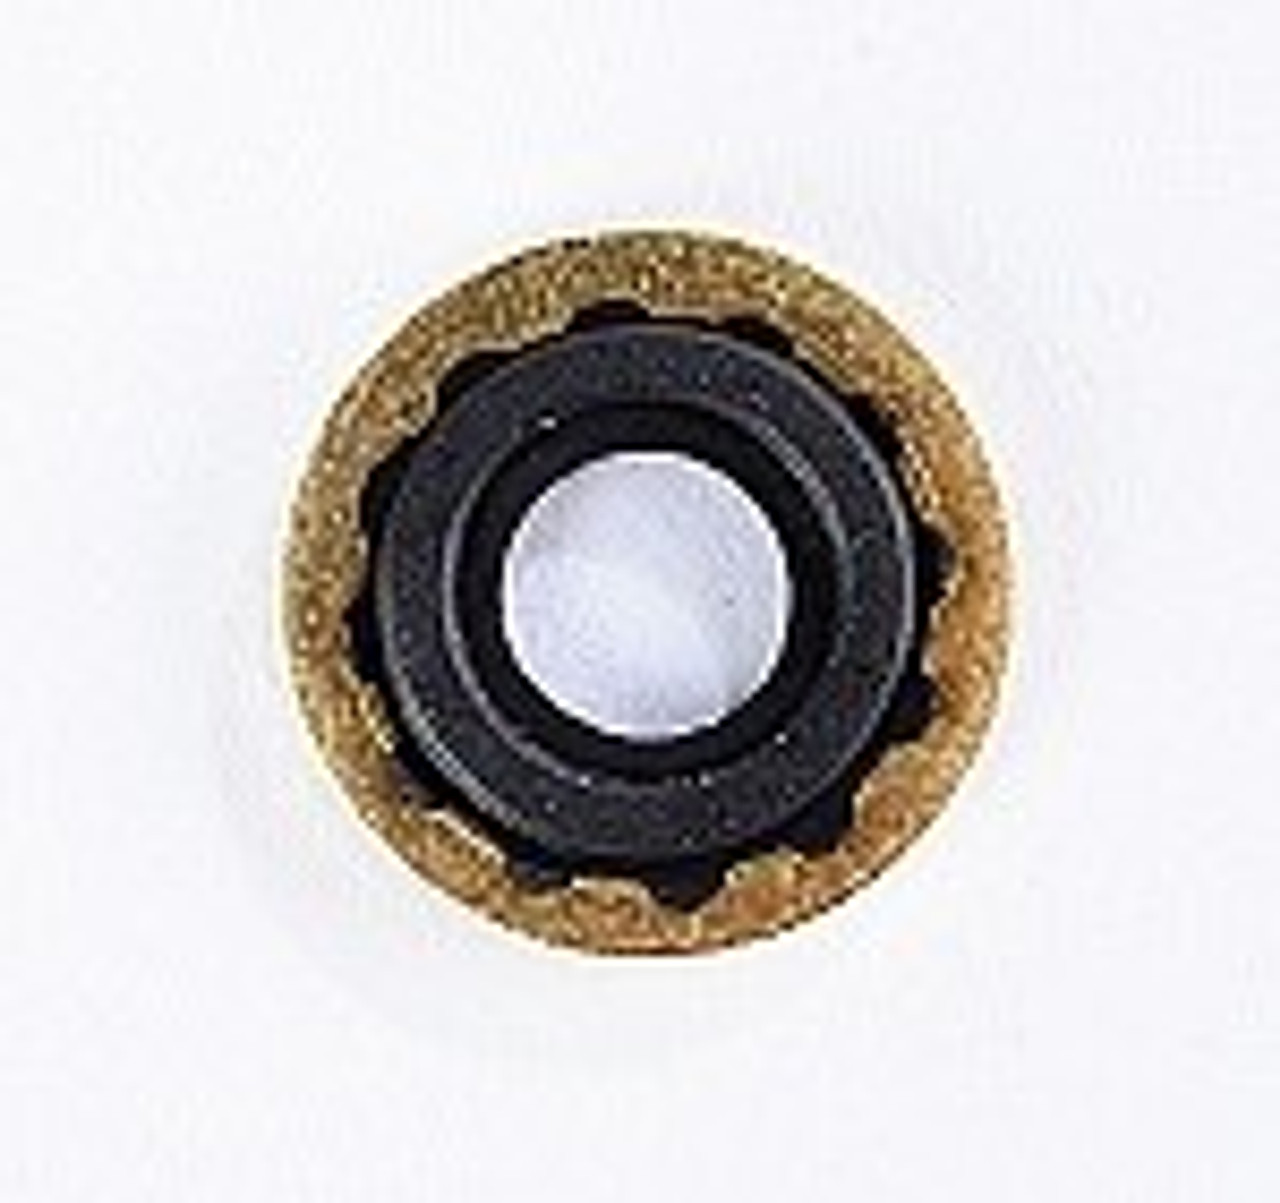 Oxygen Washer Brass with Viton insert - Each